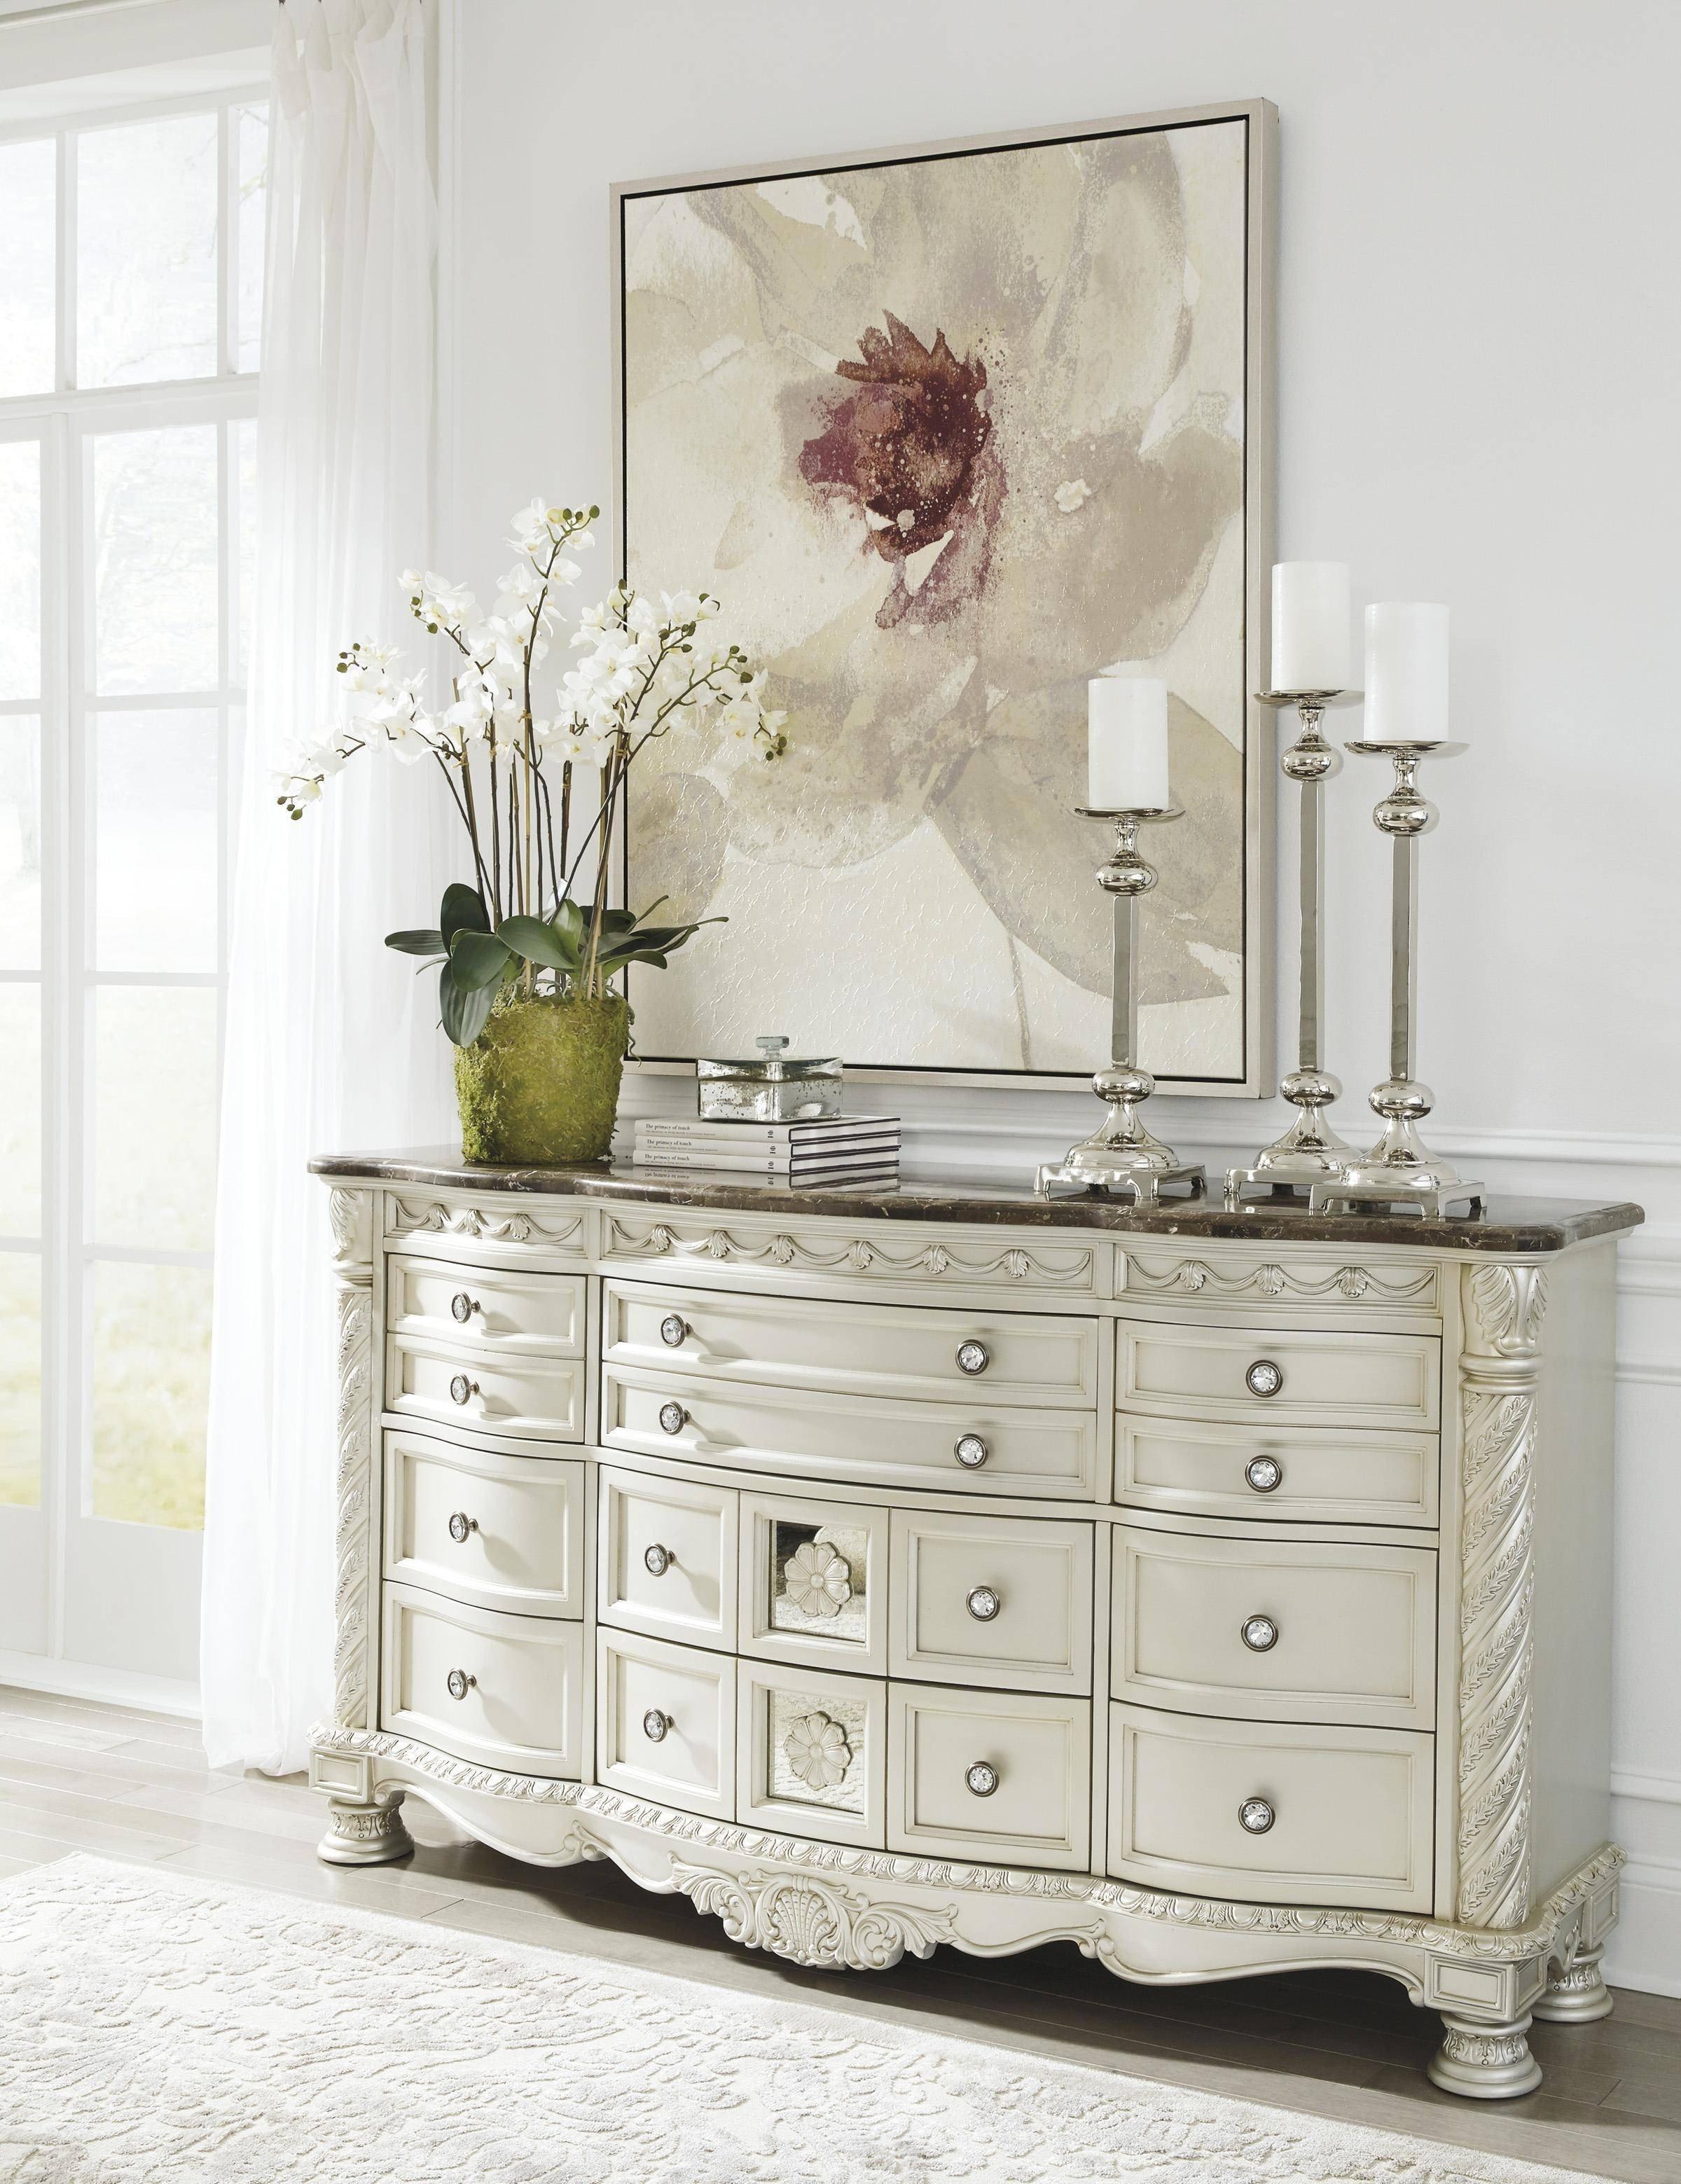 Ashley Girl Bedroom Set Luxury ashley Cassimore B750 King Size Panel Bedroom Set 5pcs In